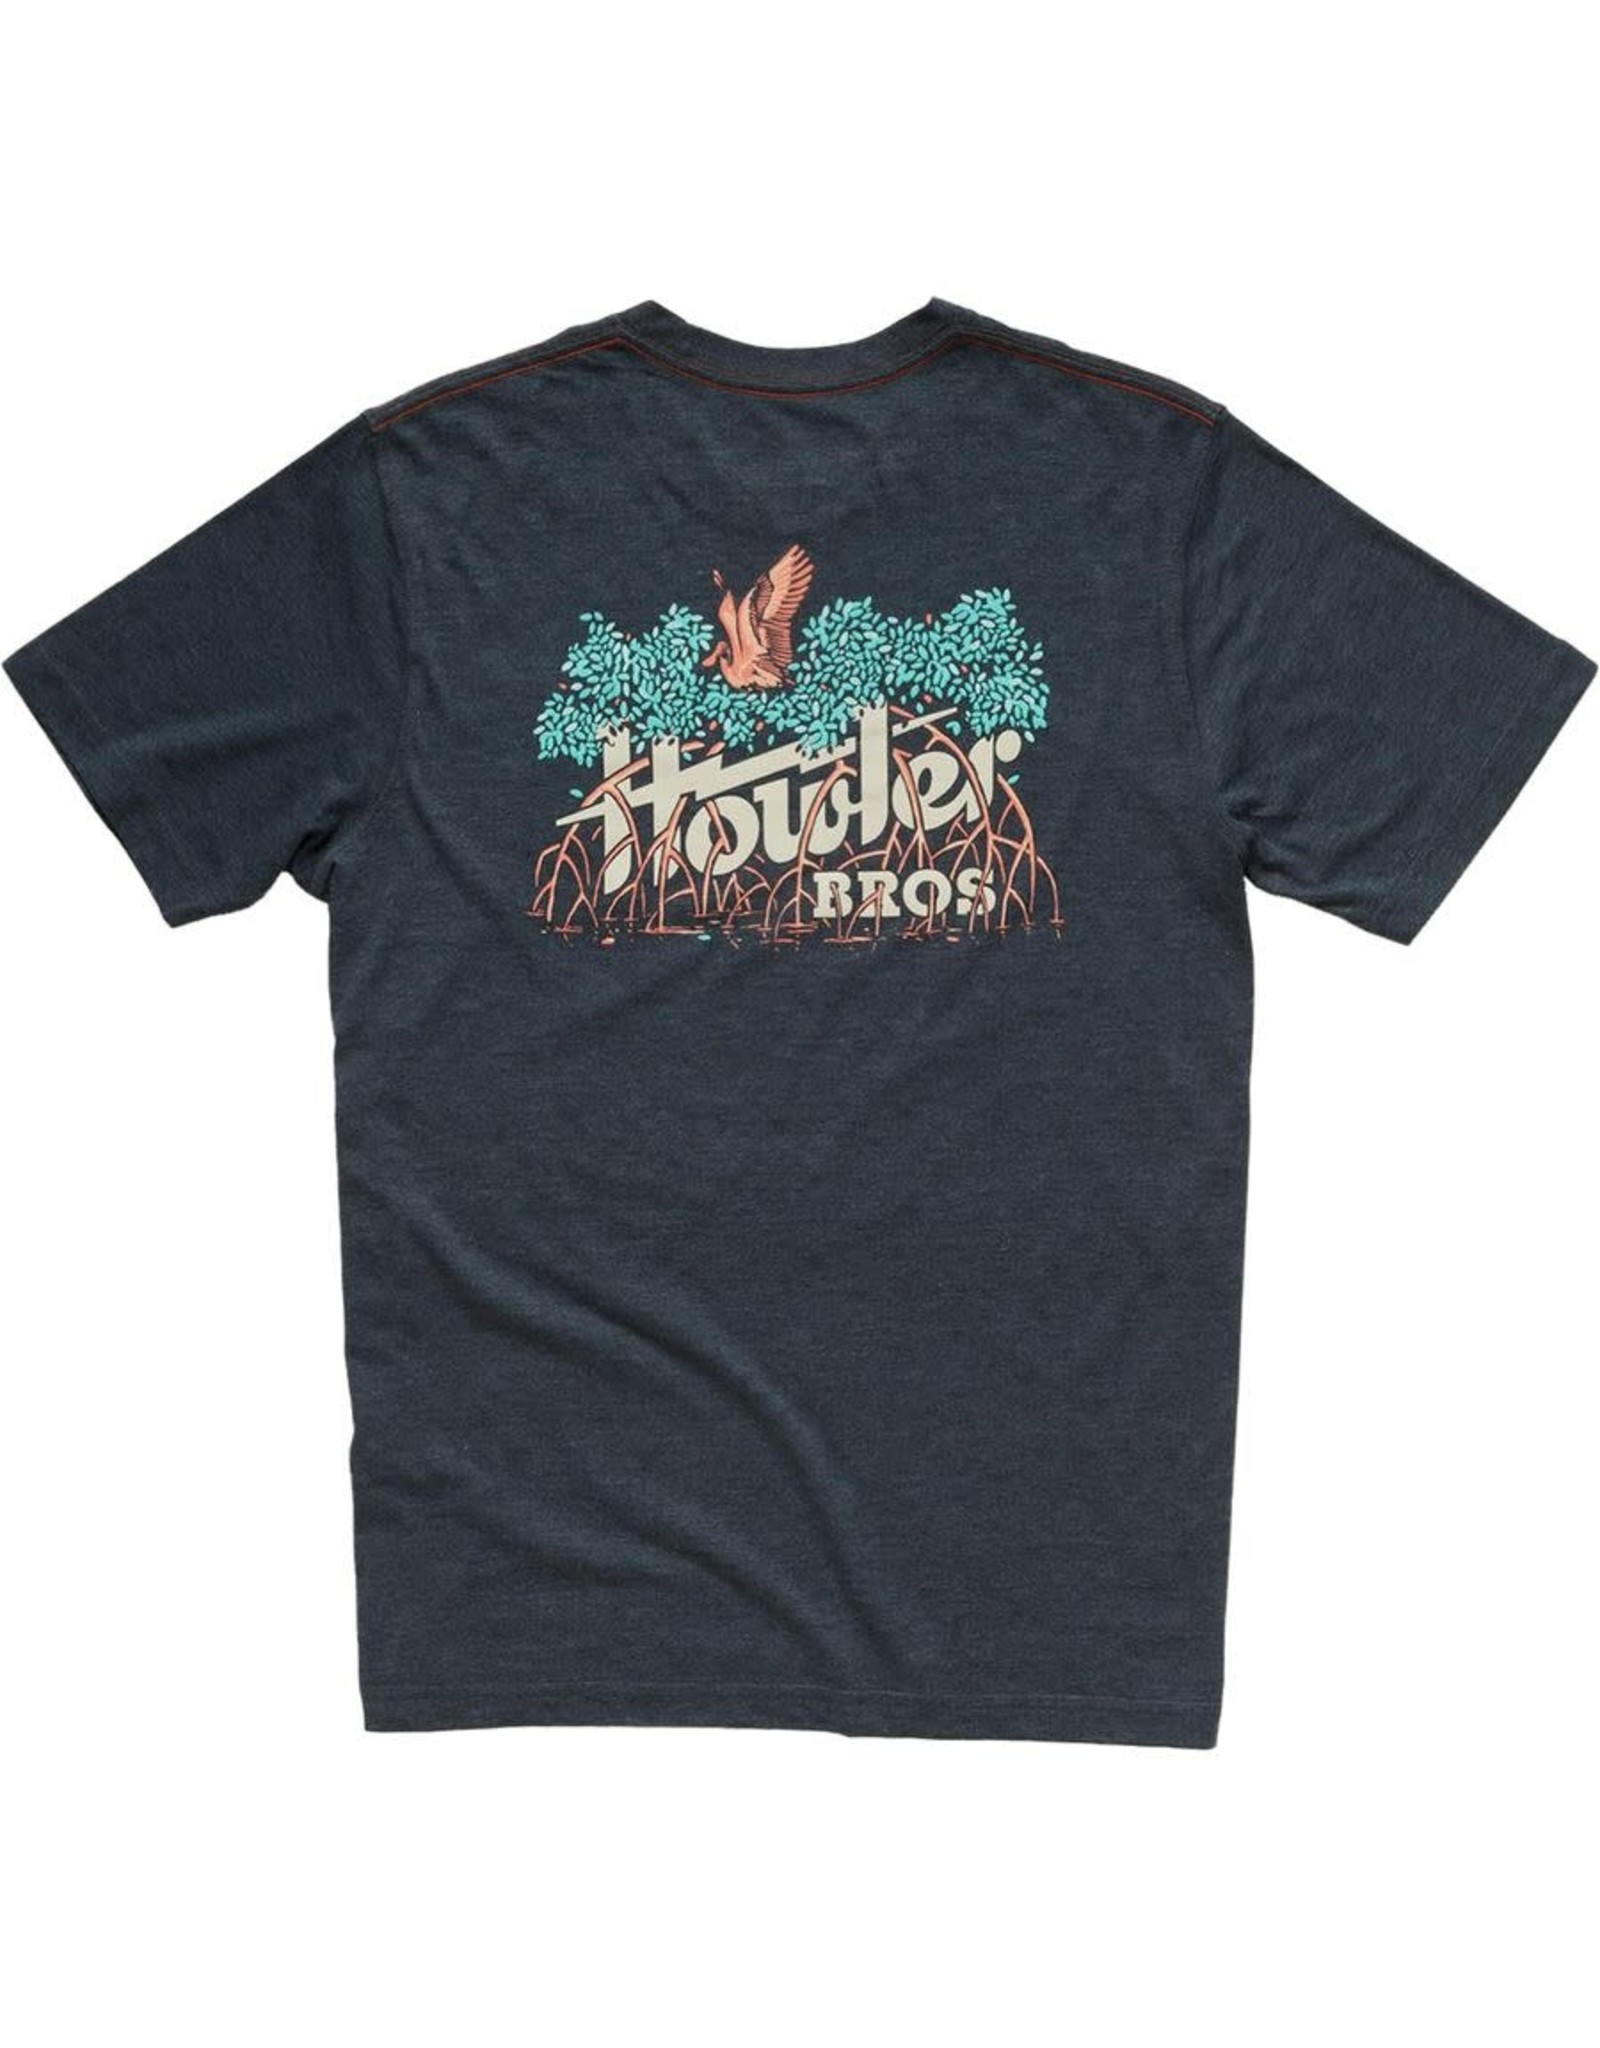 Howler Howler Electric Mangroves Tee Shirt Charcoal